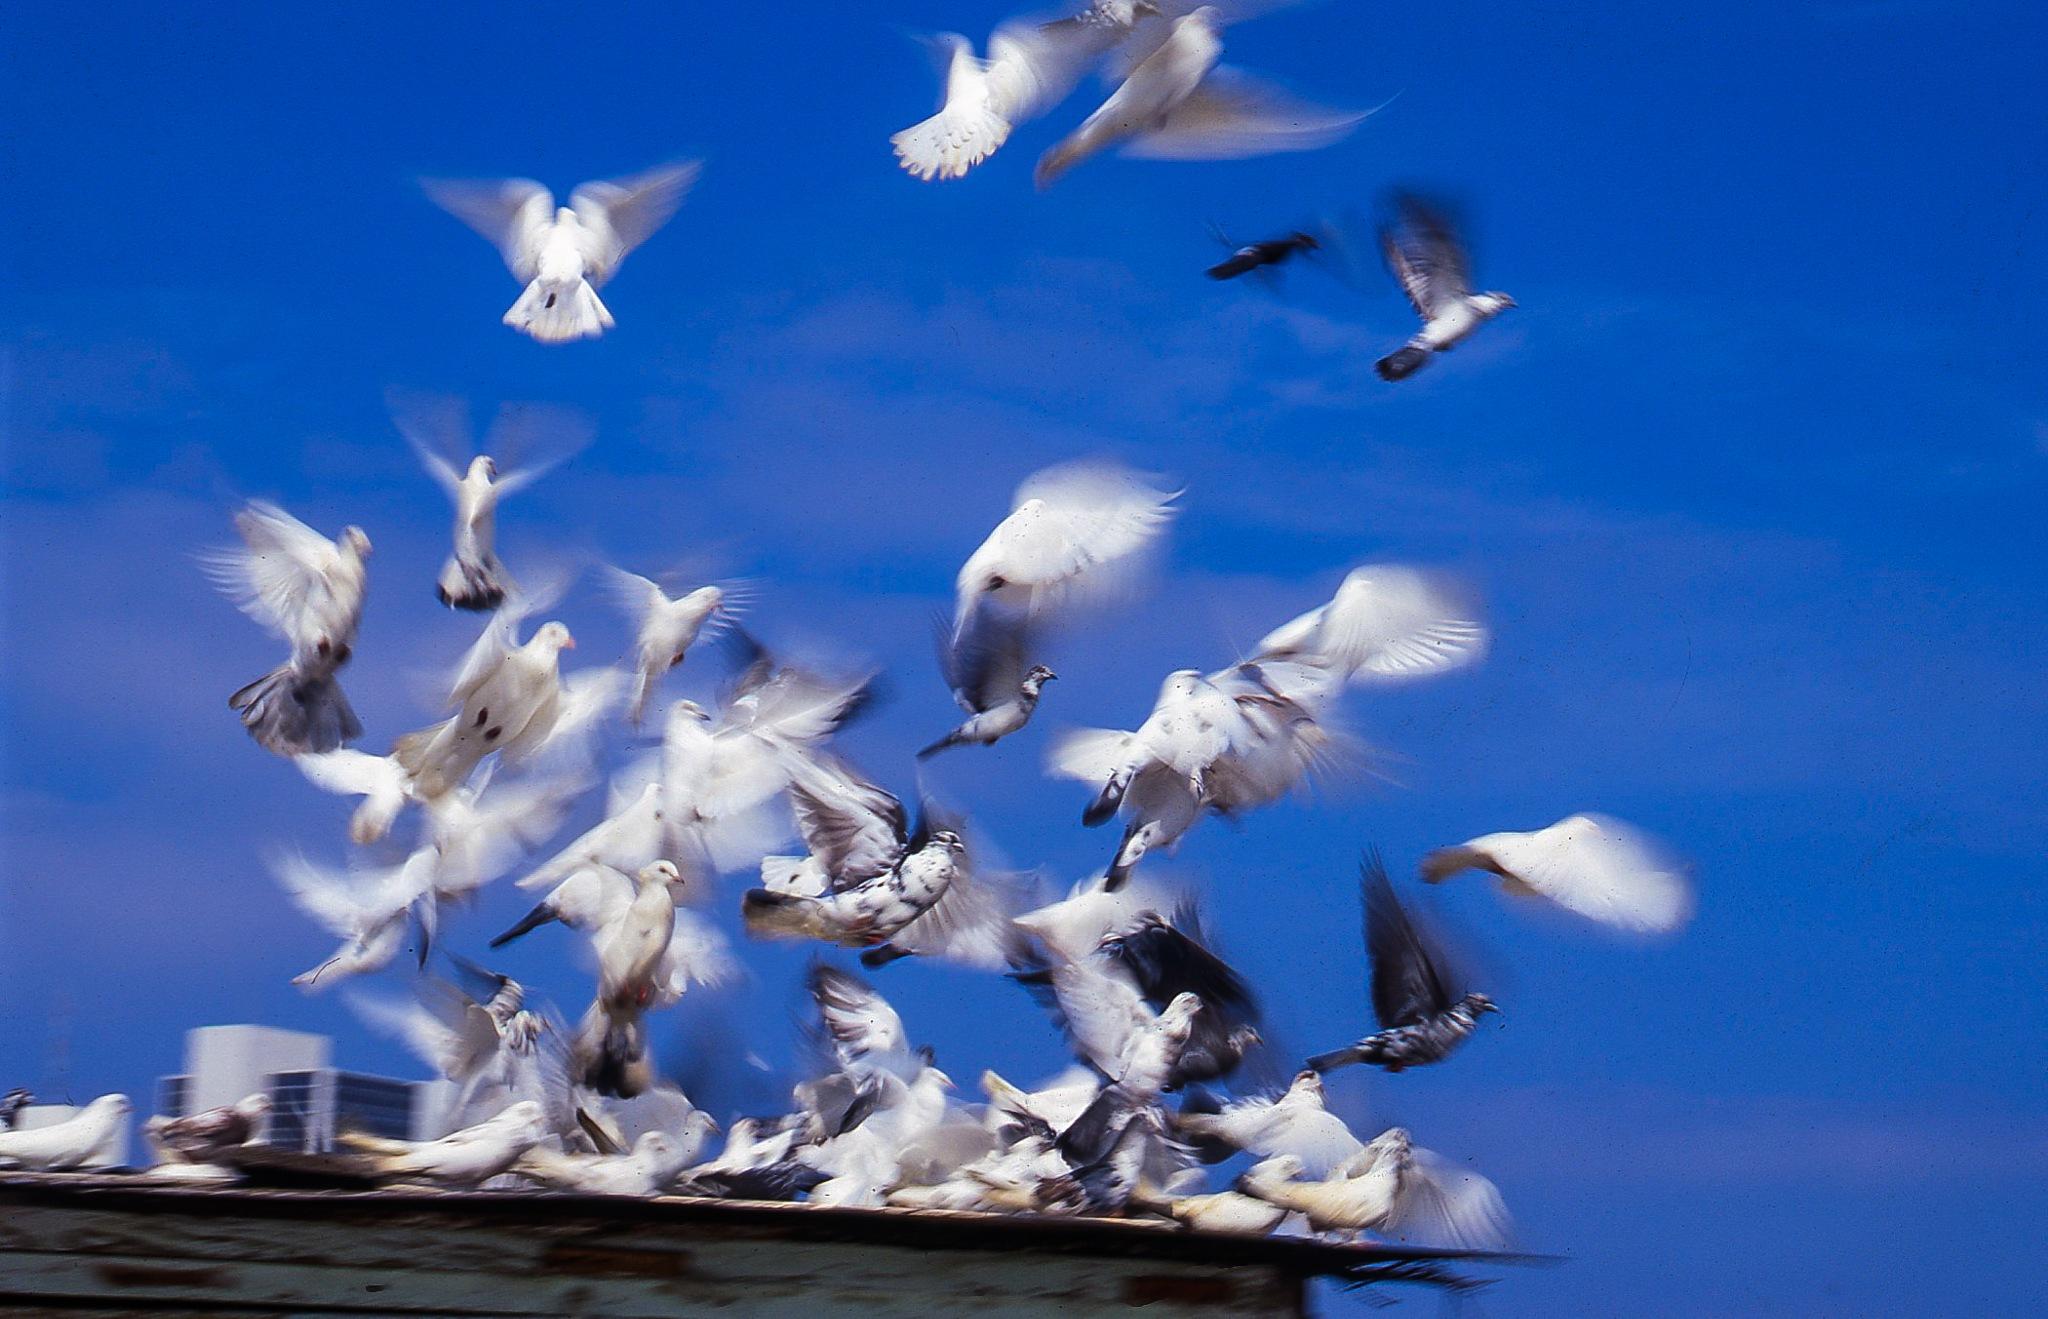 Heavenly Flight by Ron Stollman